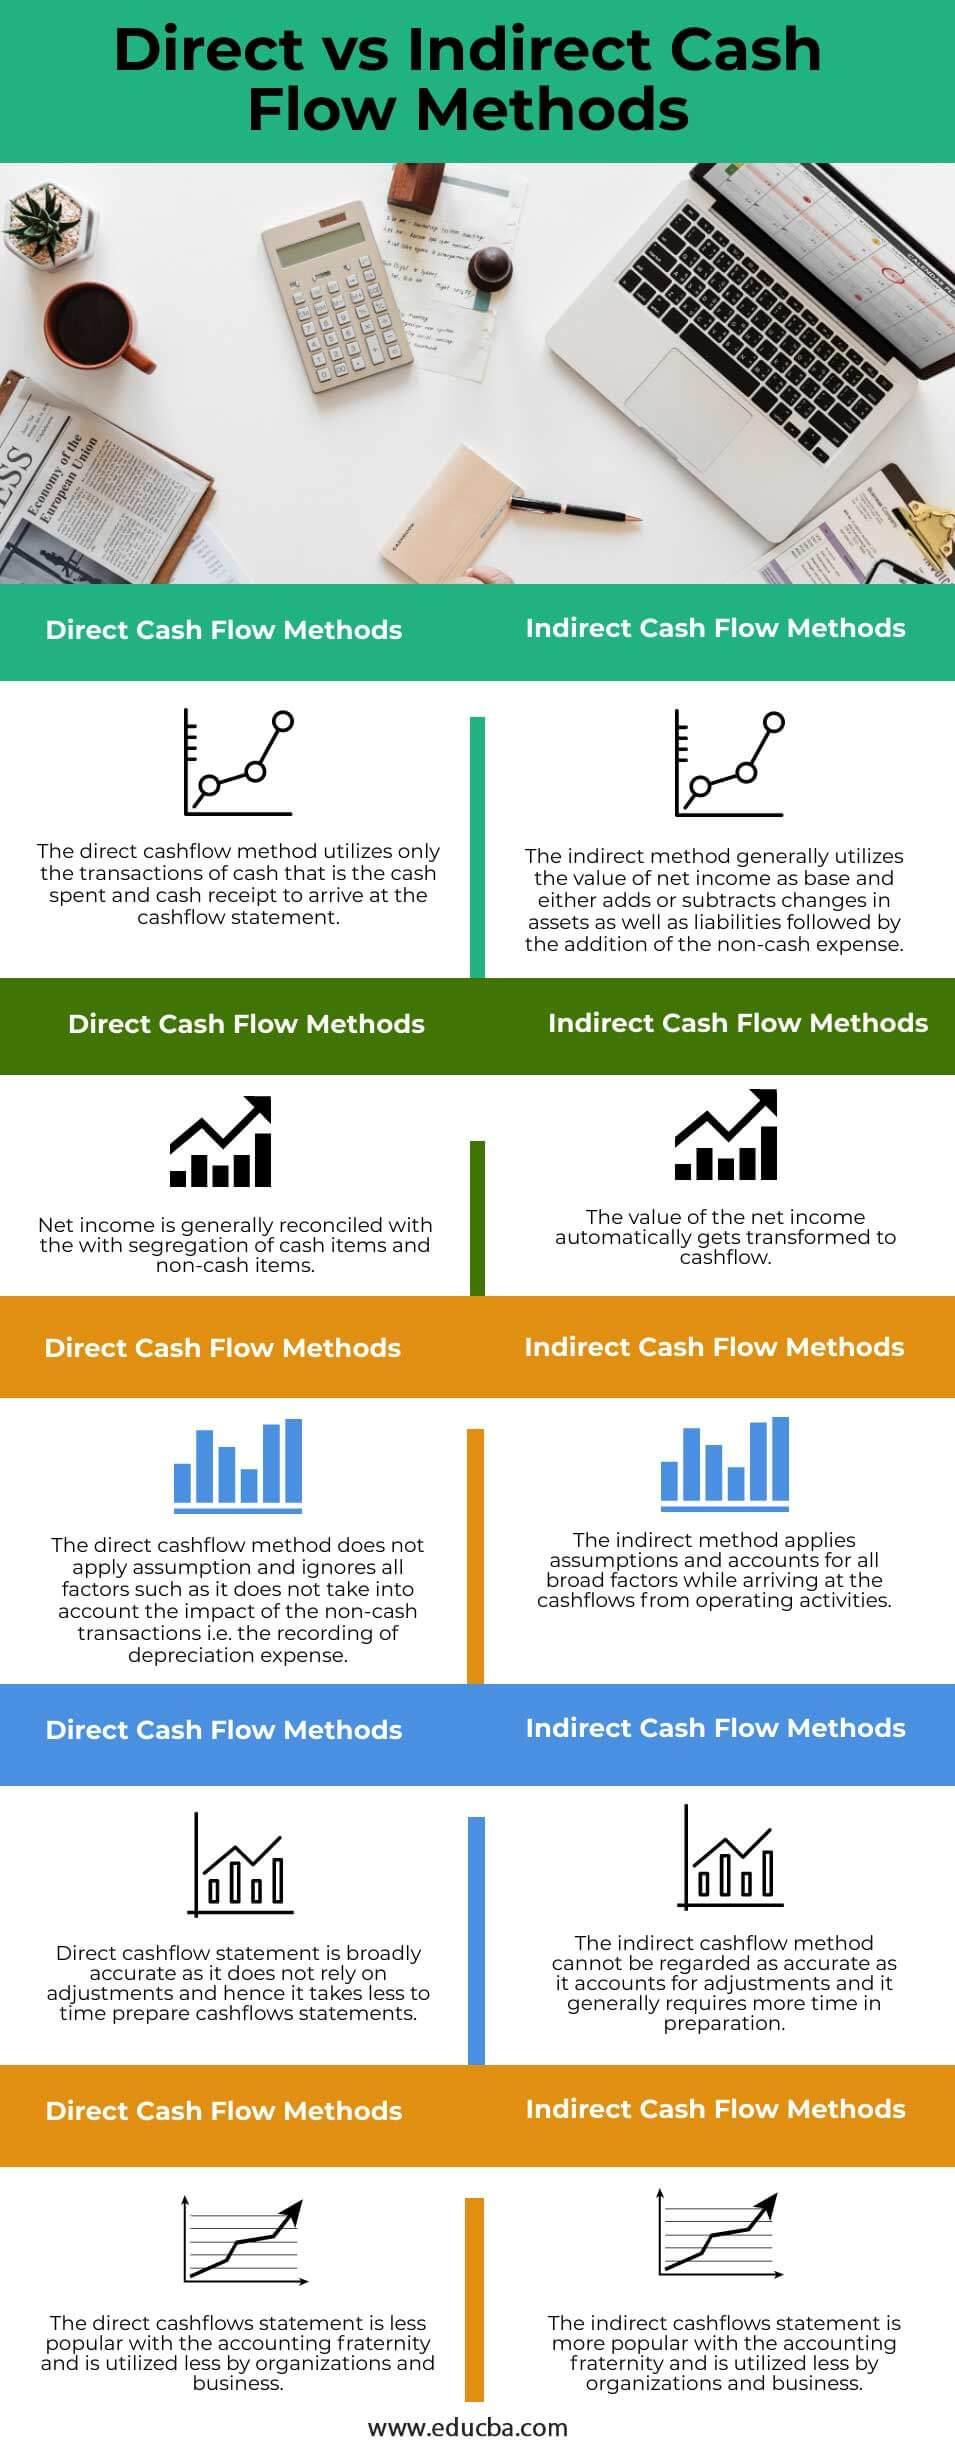 Direct-vs-Indirect-Cash-Flow-Methods-info